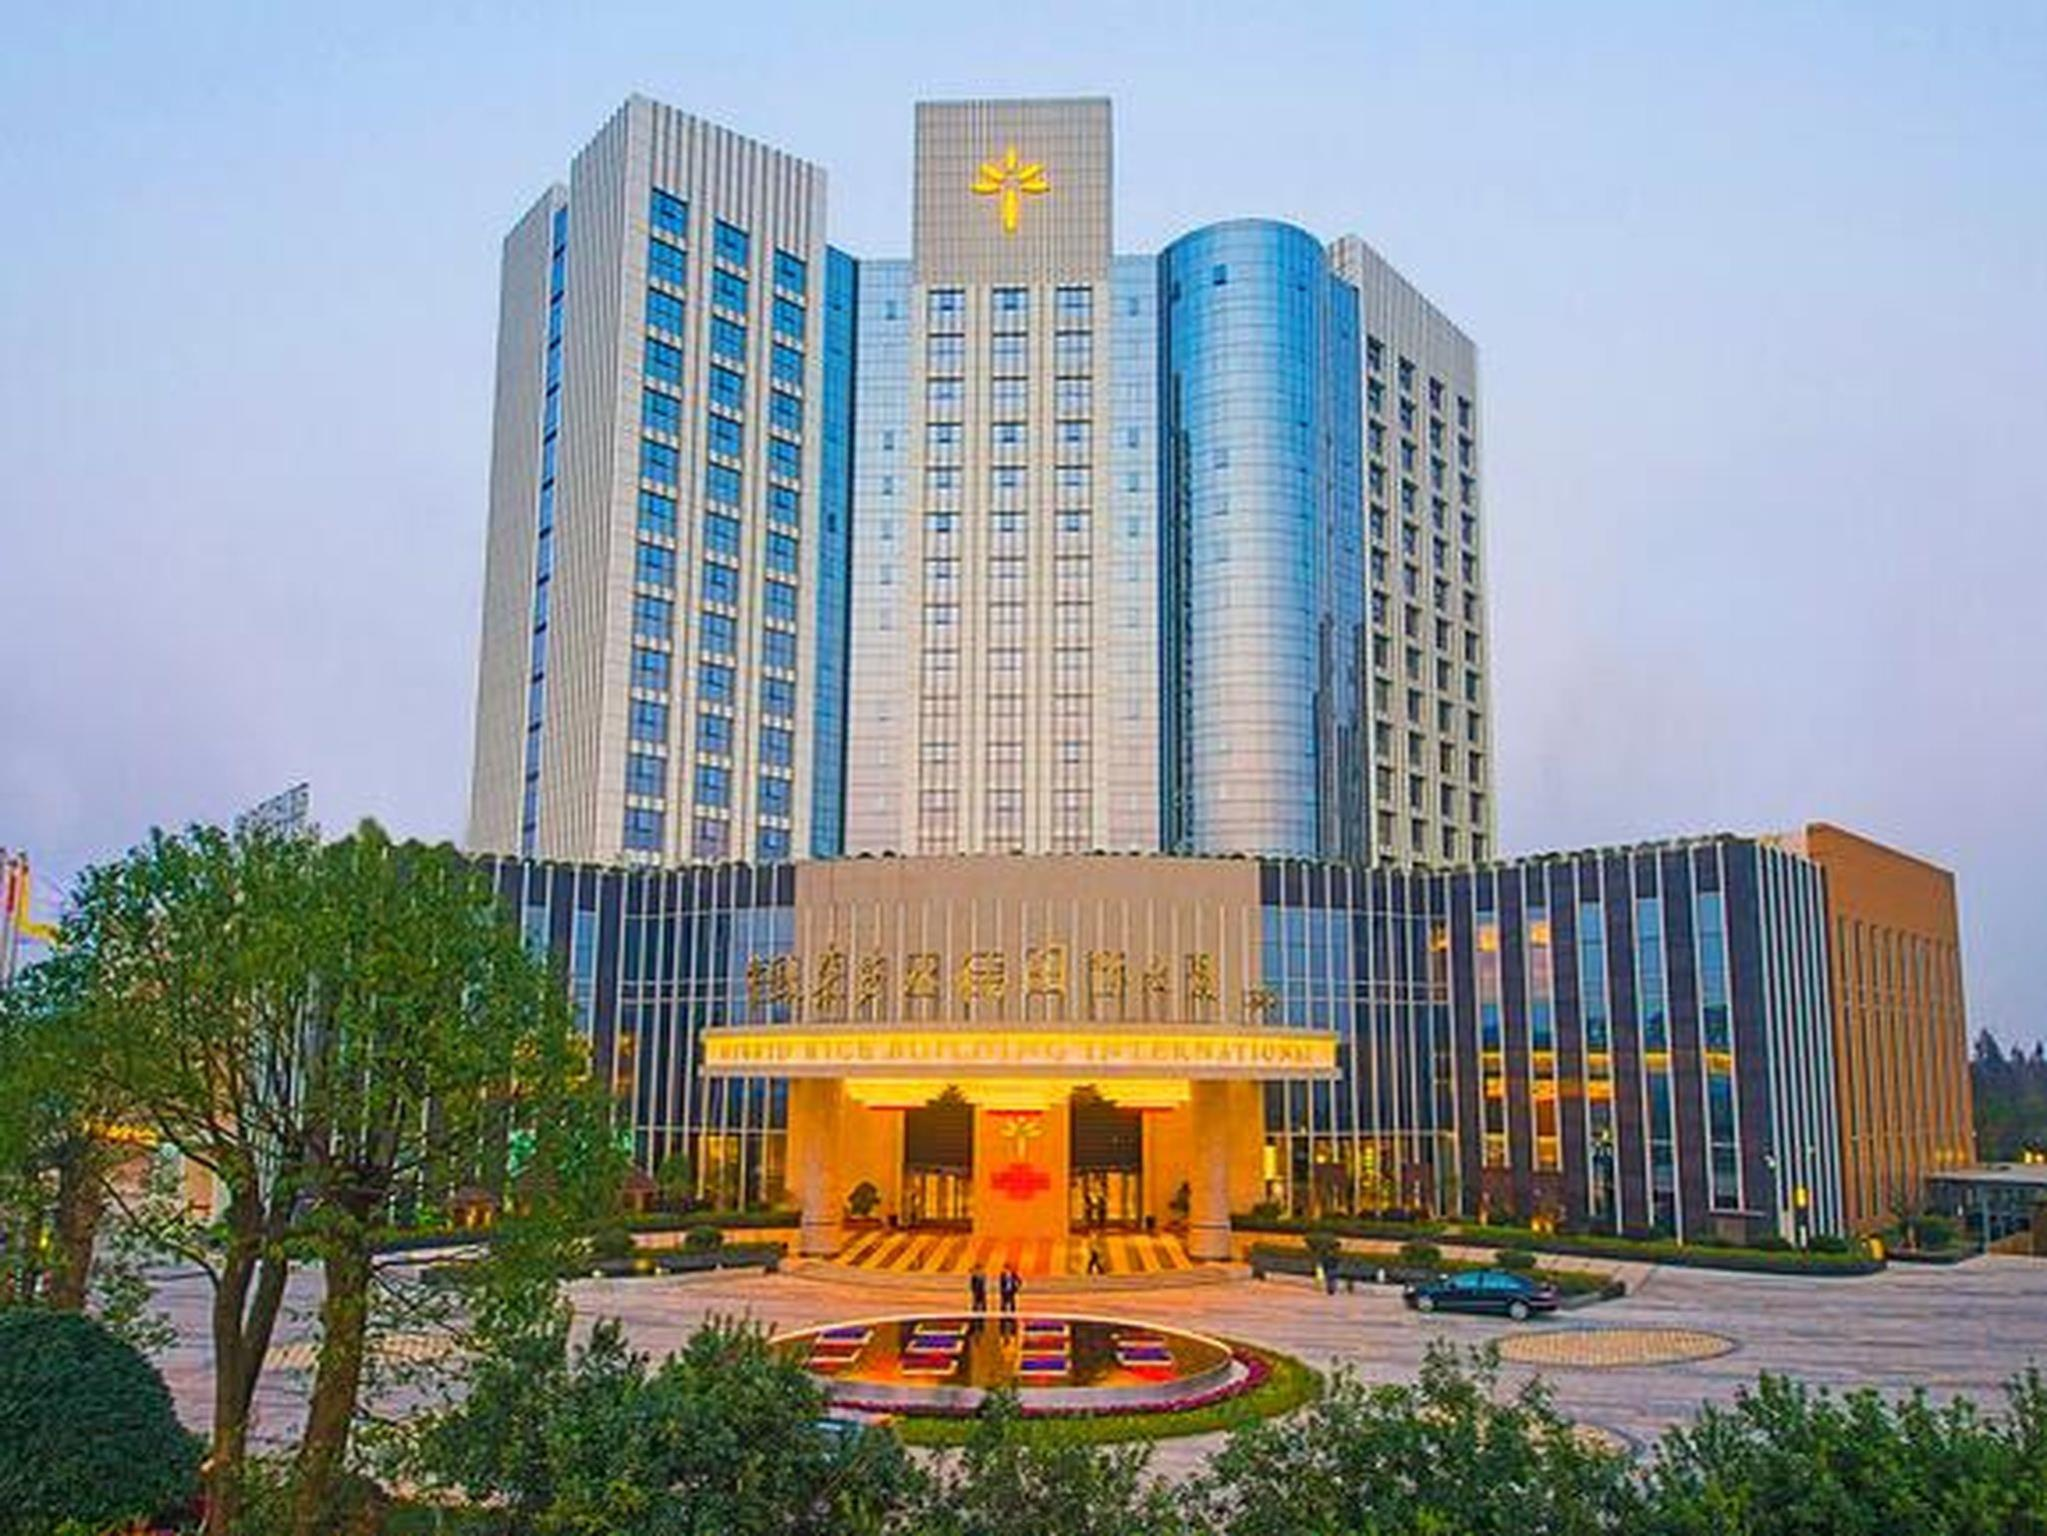 Changsha Longhua International Hotel